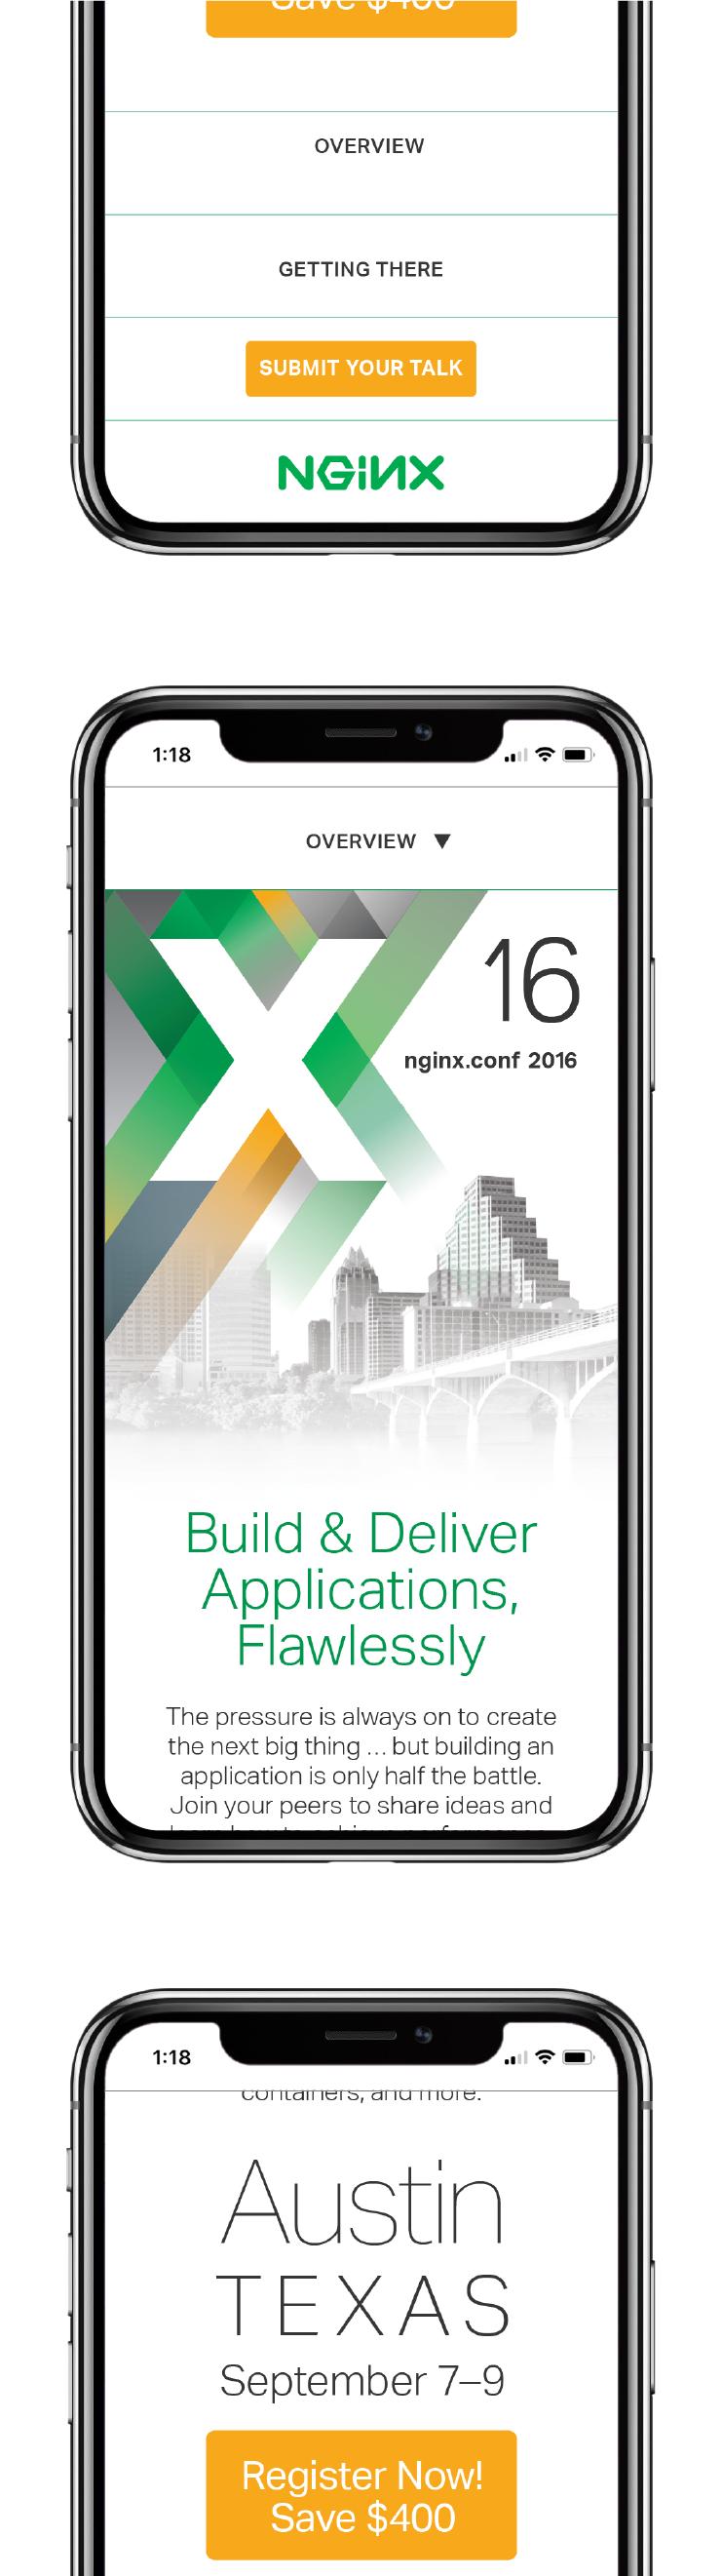 NGINX Austin website mobile responsive 1